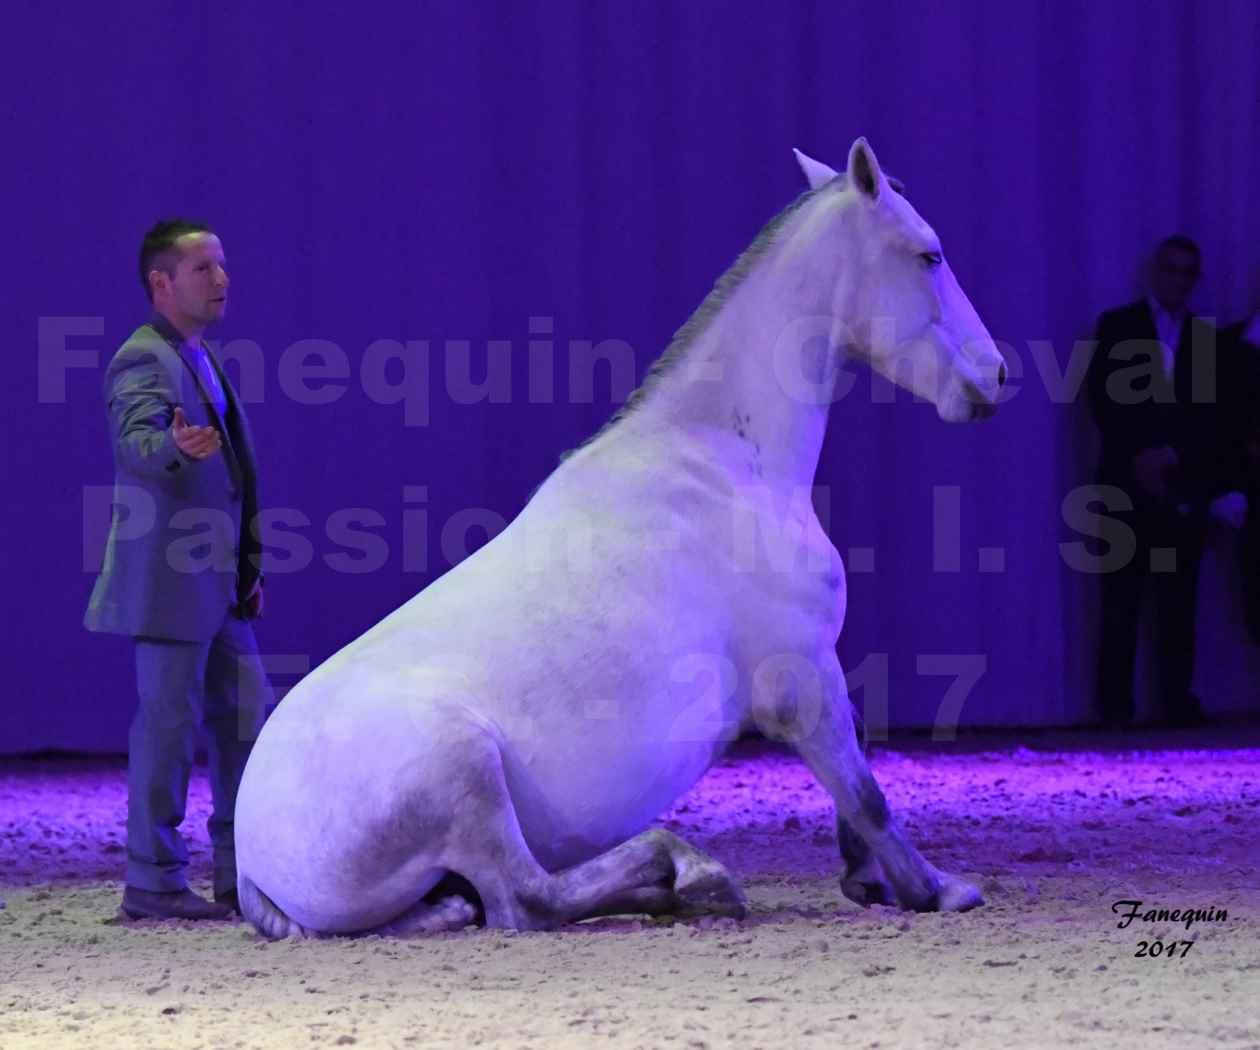 Cheval Passion 2017 - M. I. S. E. C. - Ludovic LONGO & 1 cheval en liberté - 20